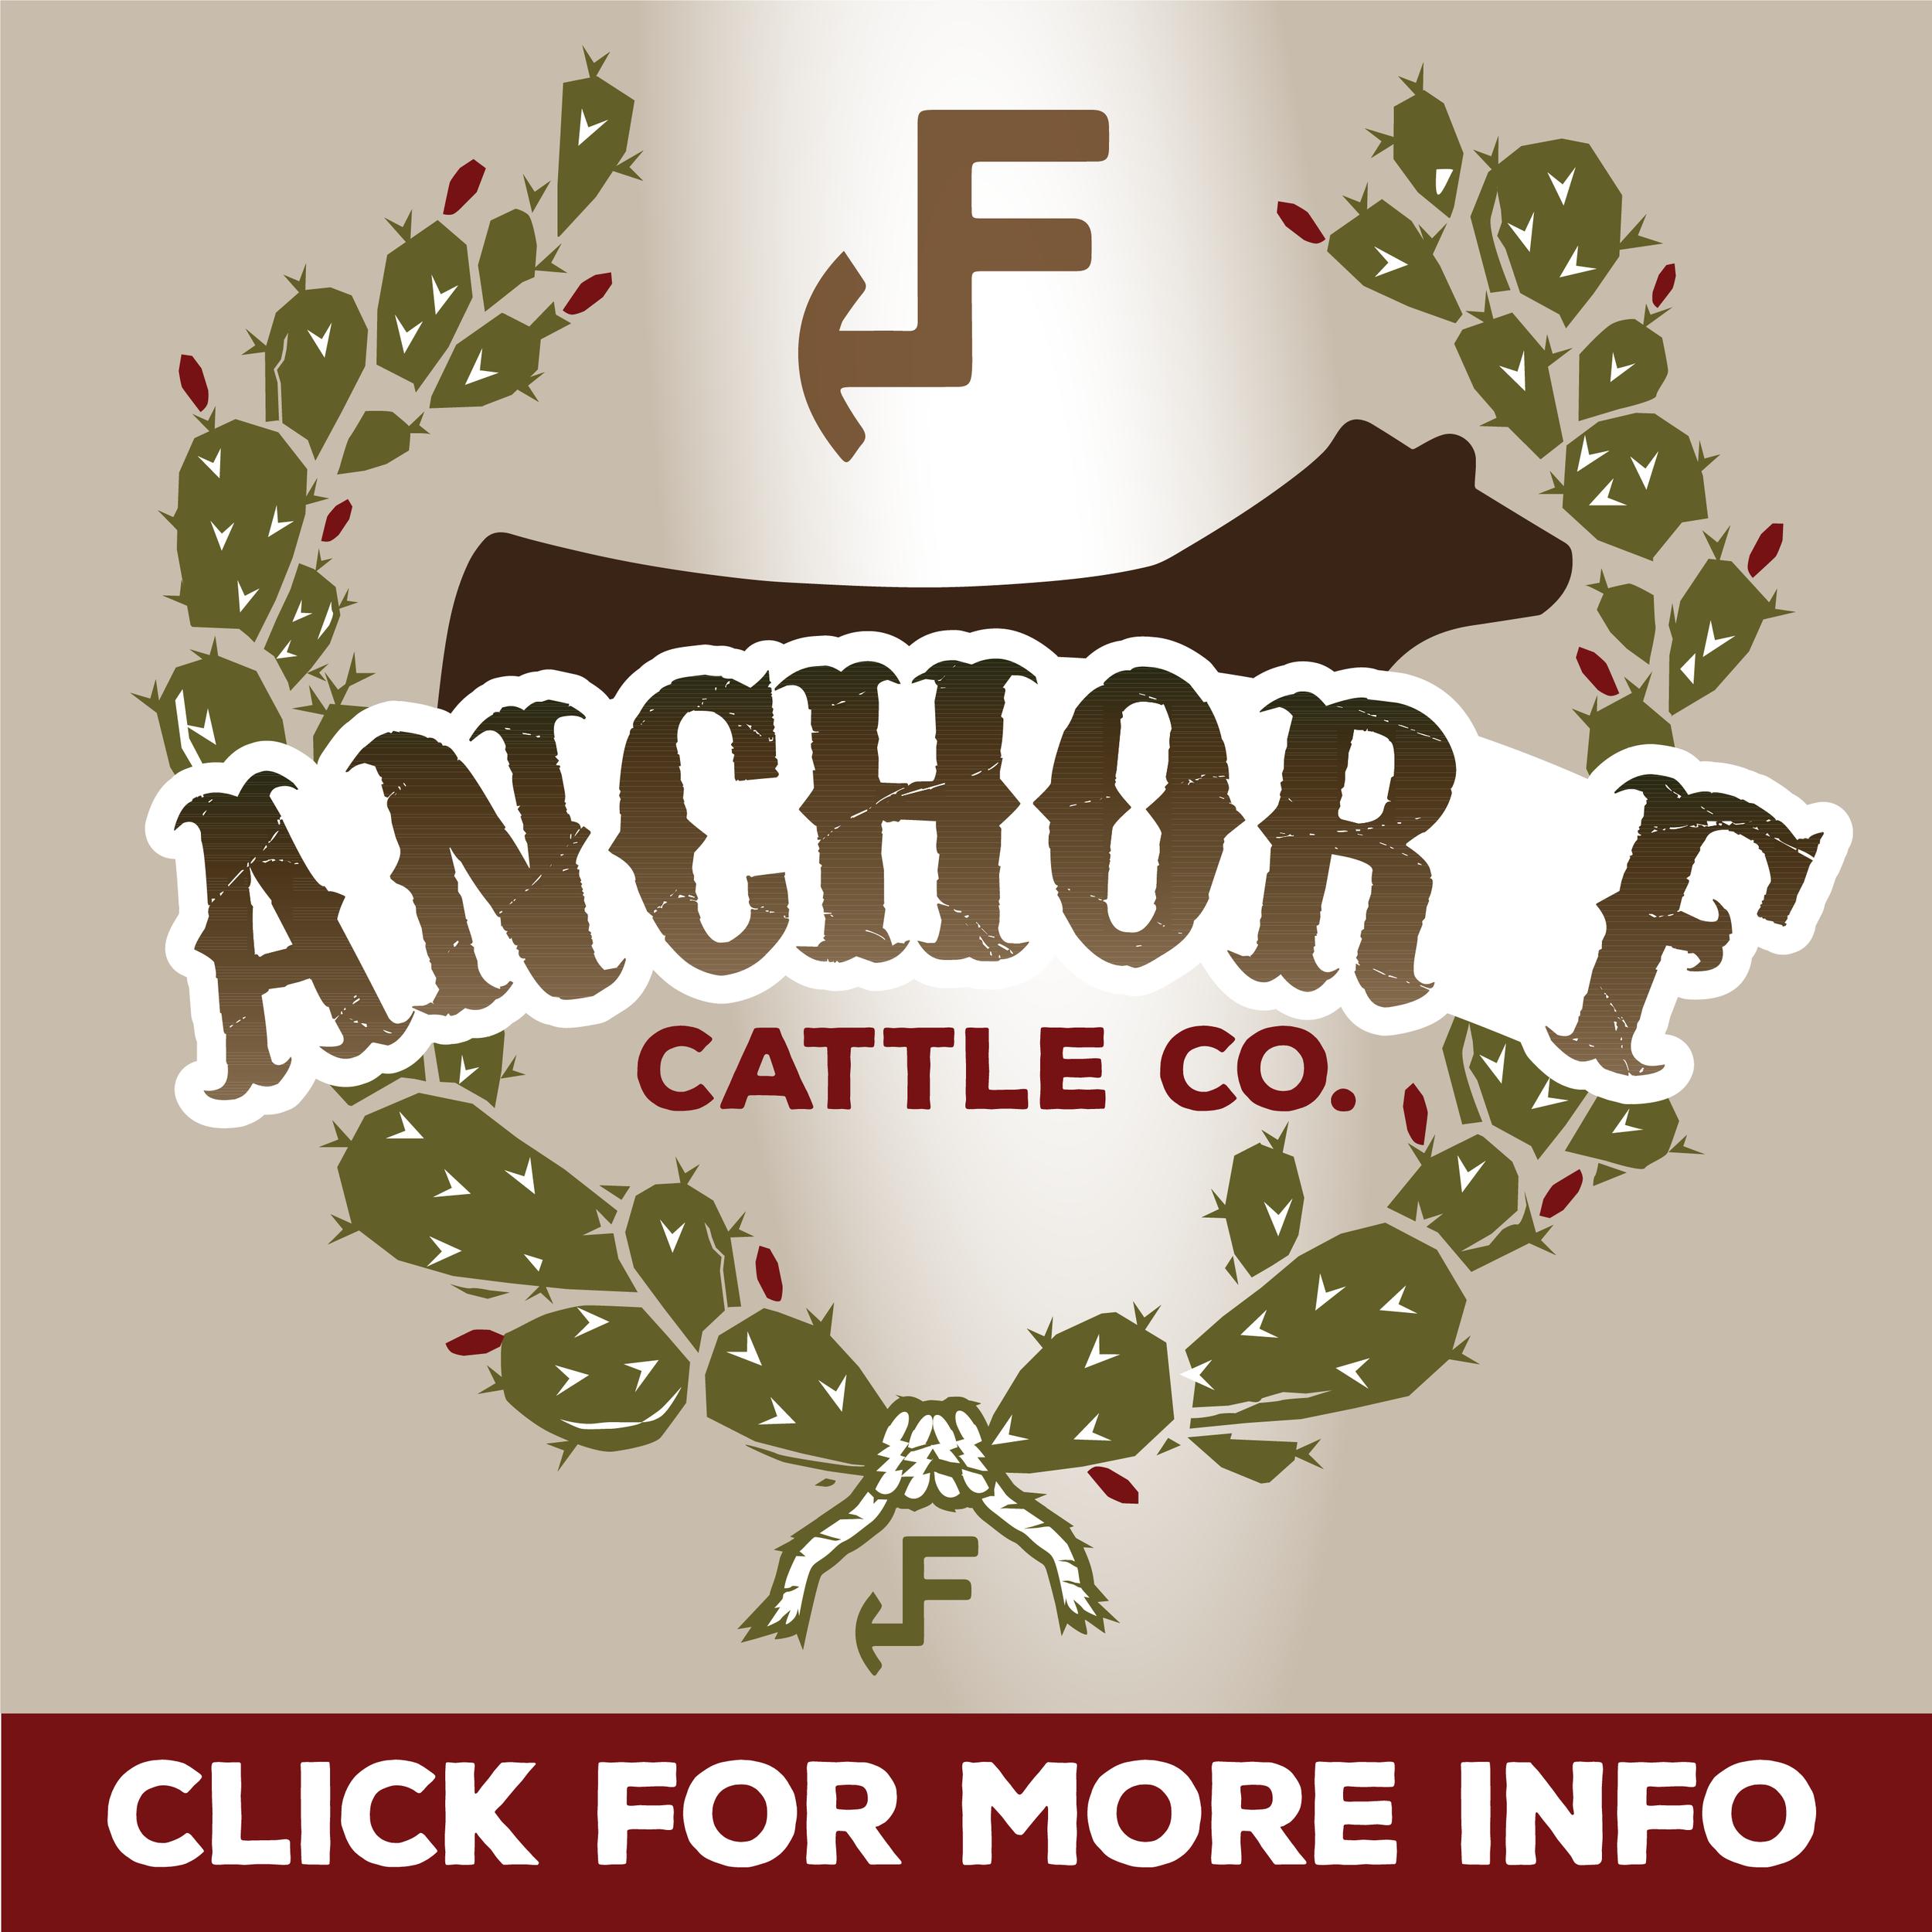 Anchor F Cattle Co: Dean Fish anchorf@gmail.com